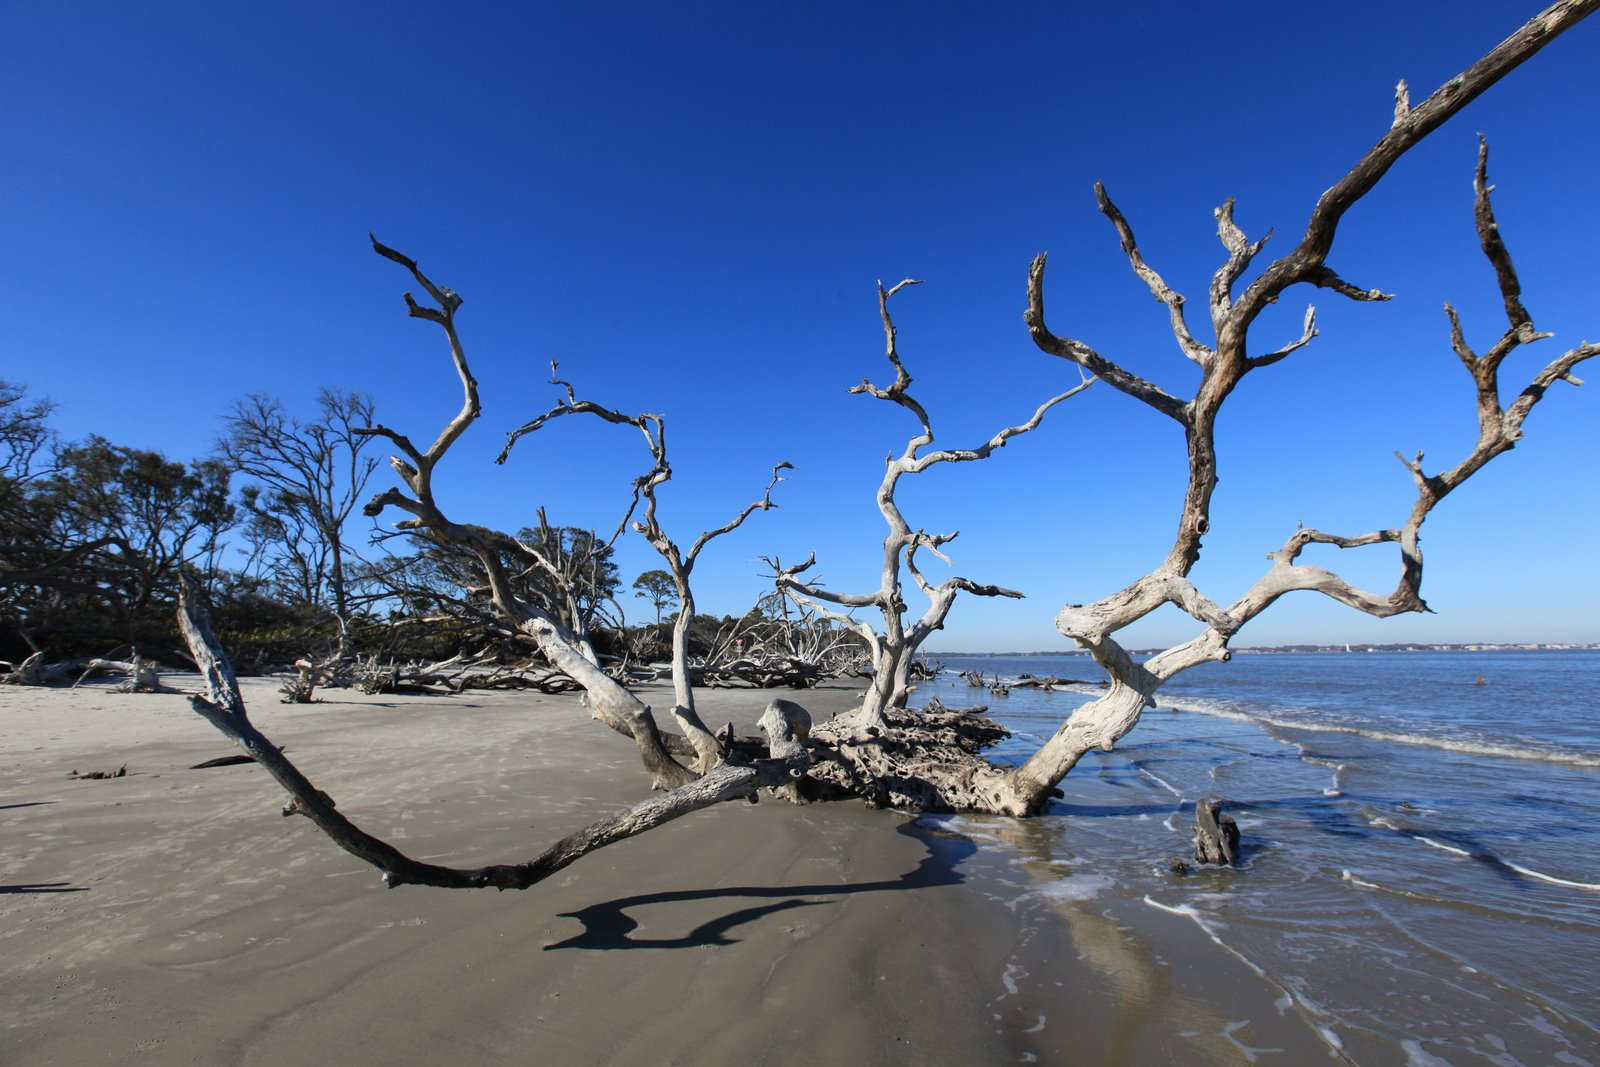 Today S Creations Driftwood Beach Jekyll Island